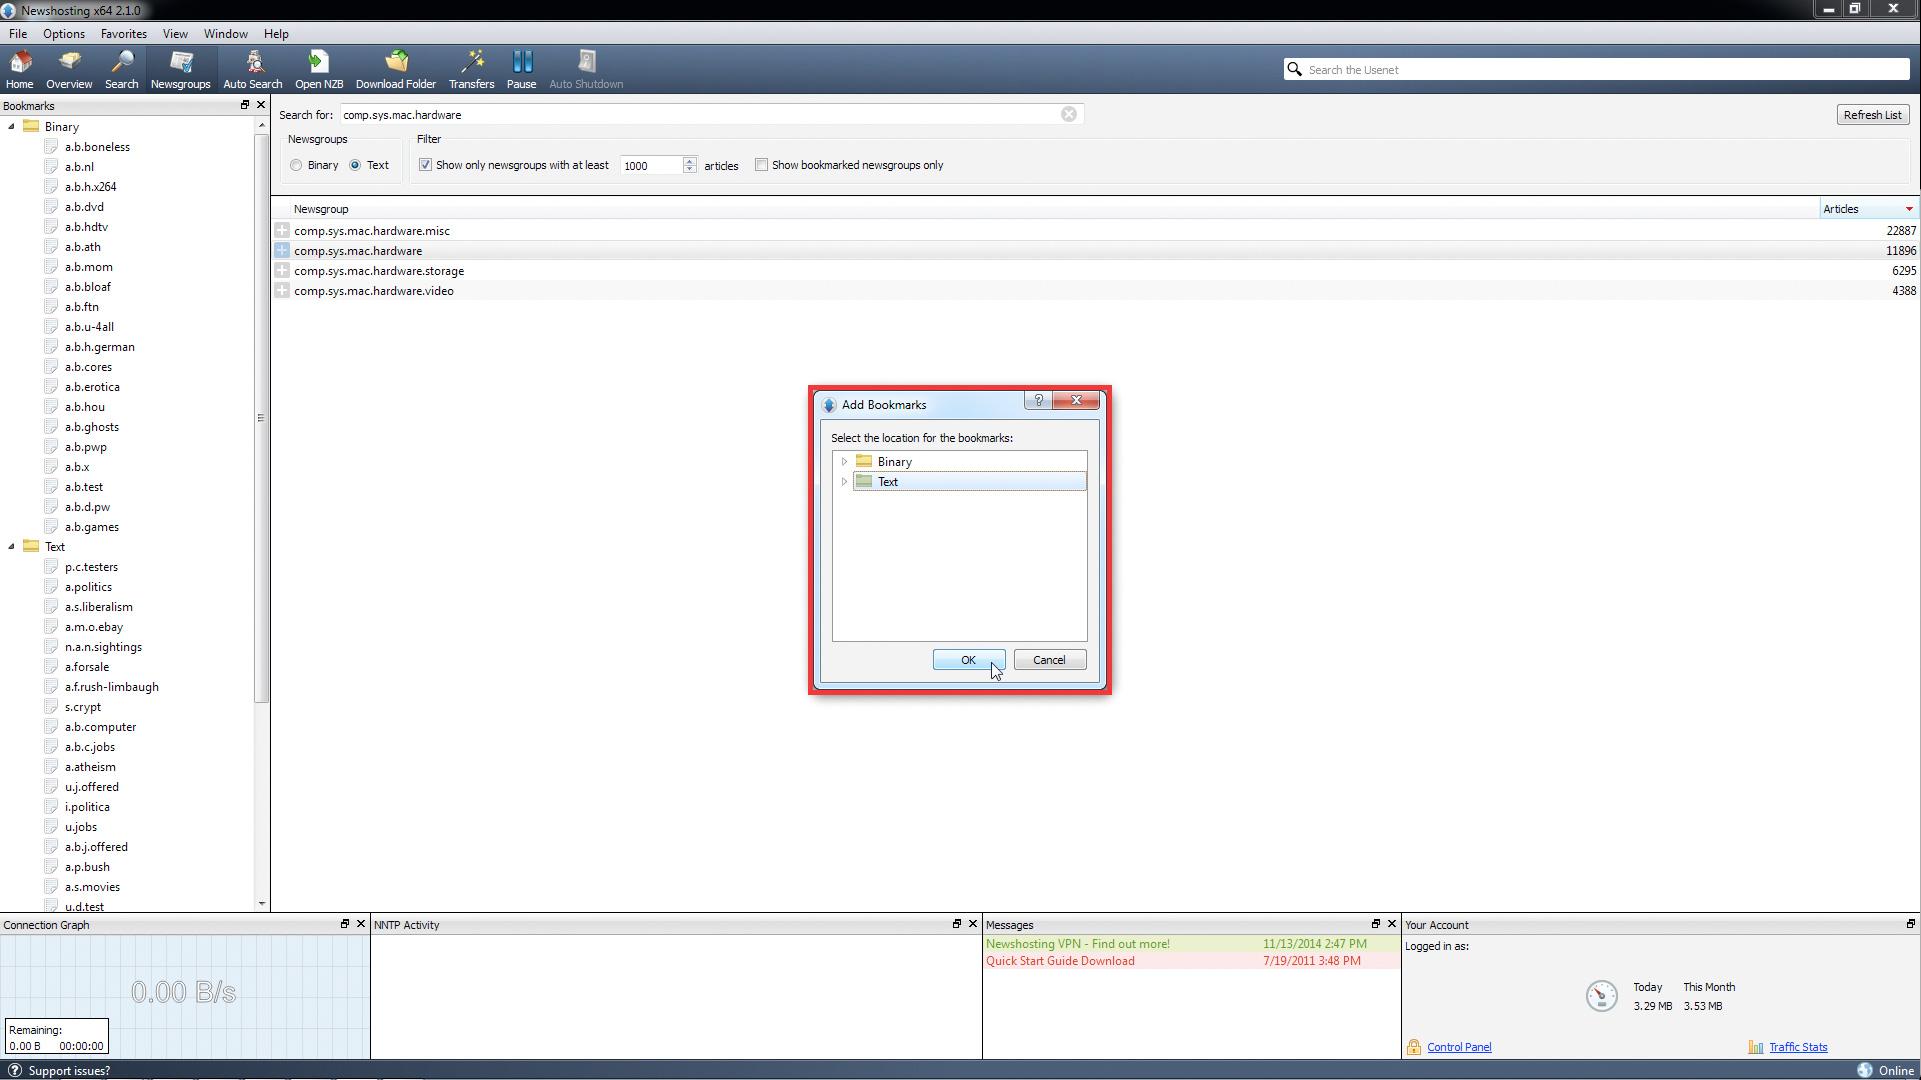 Binary options Alpari: description, demo account, technology and reviews